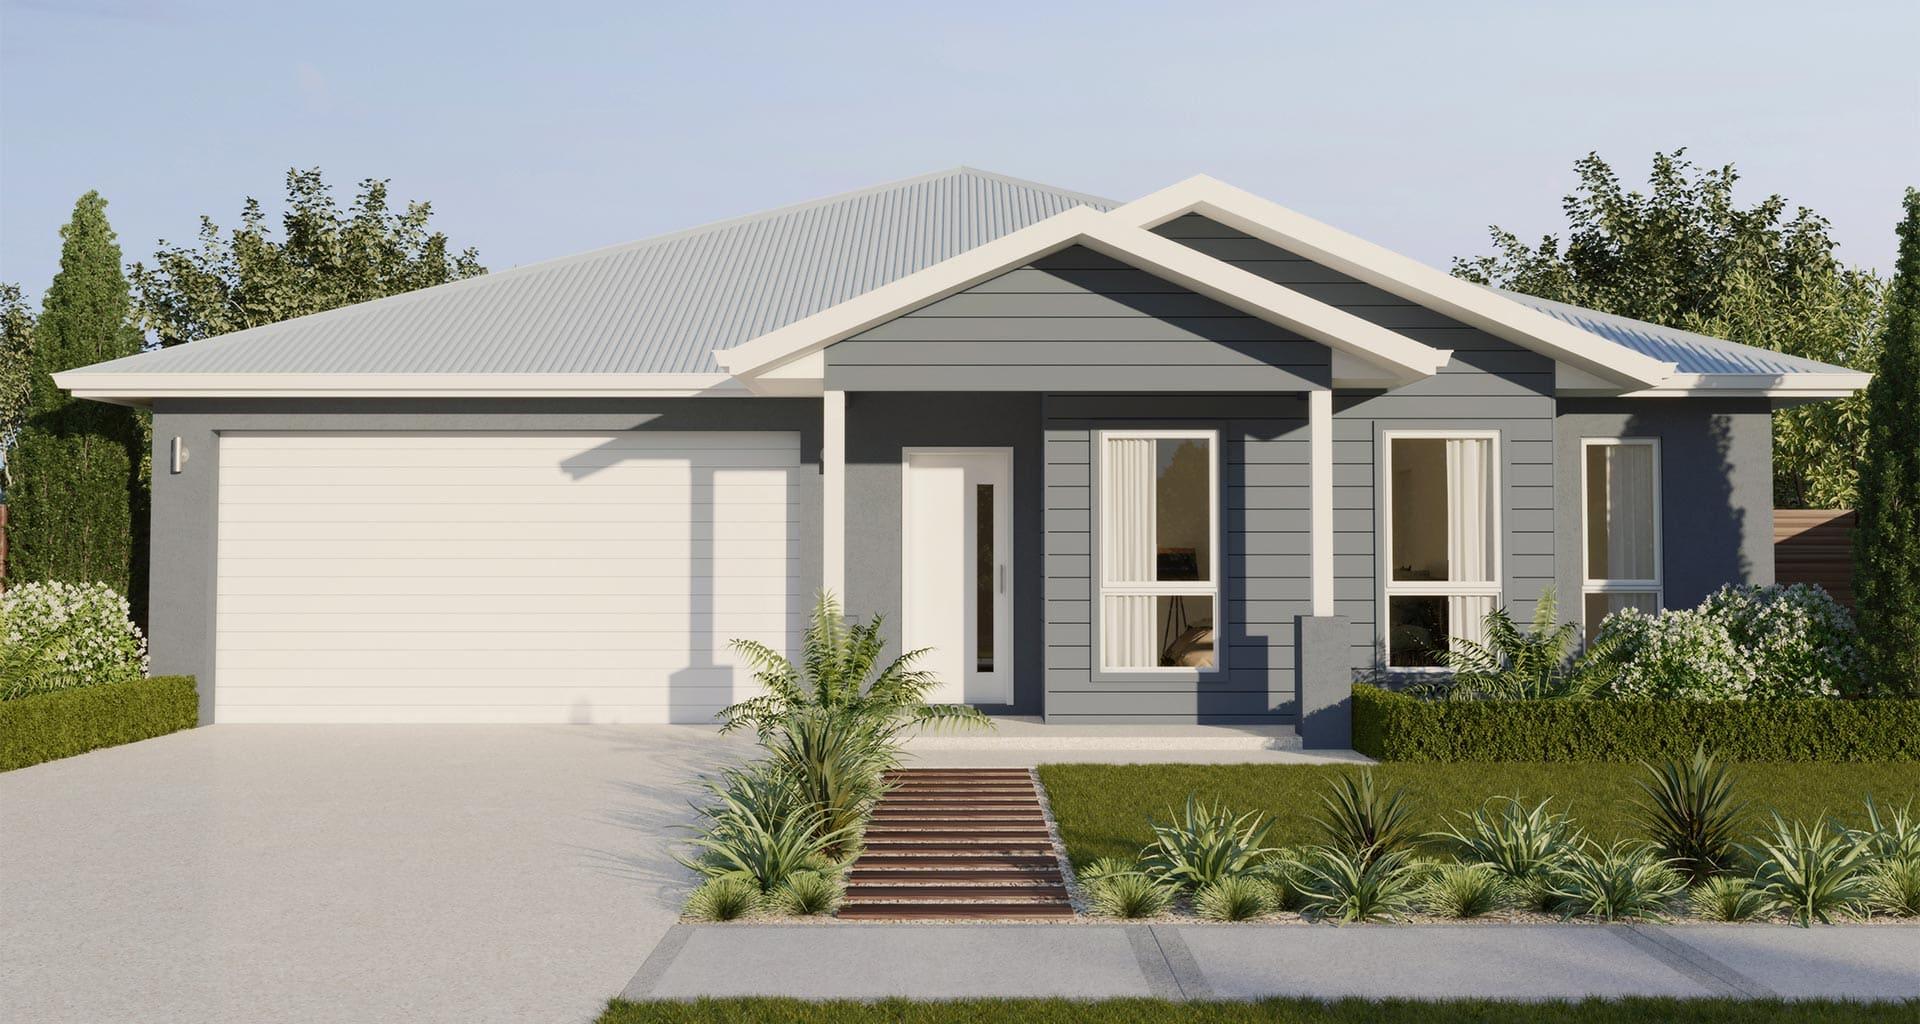 Tulip-Single-House-Design updated